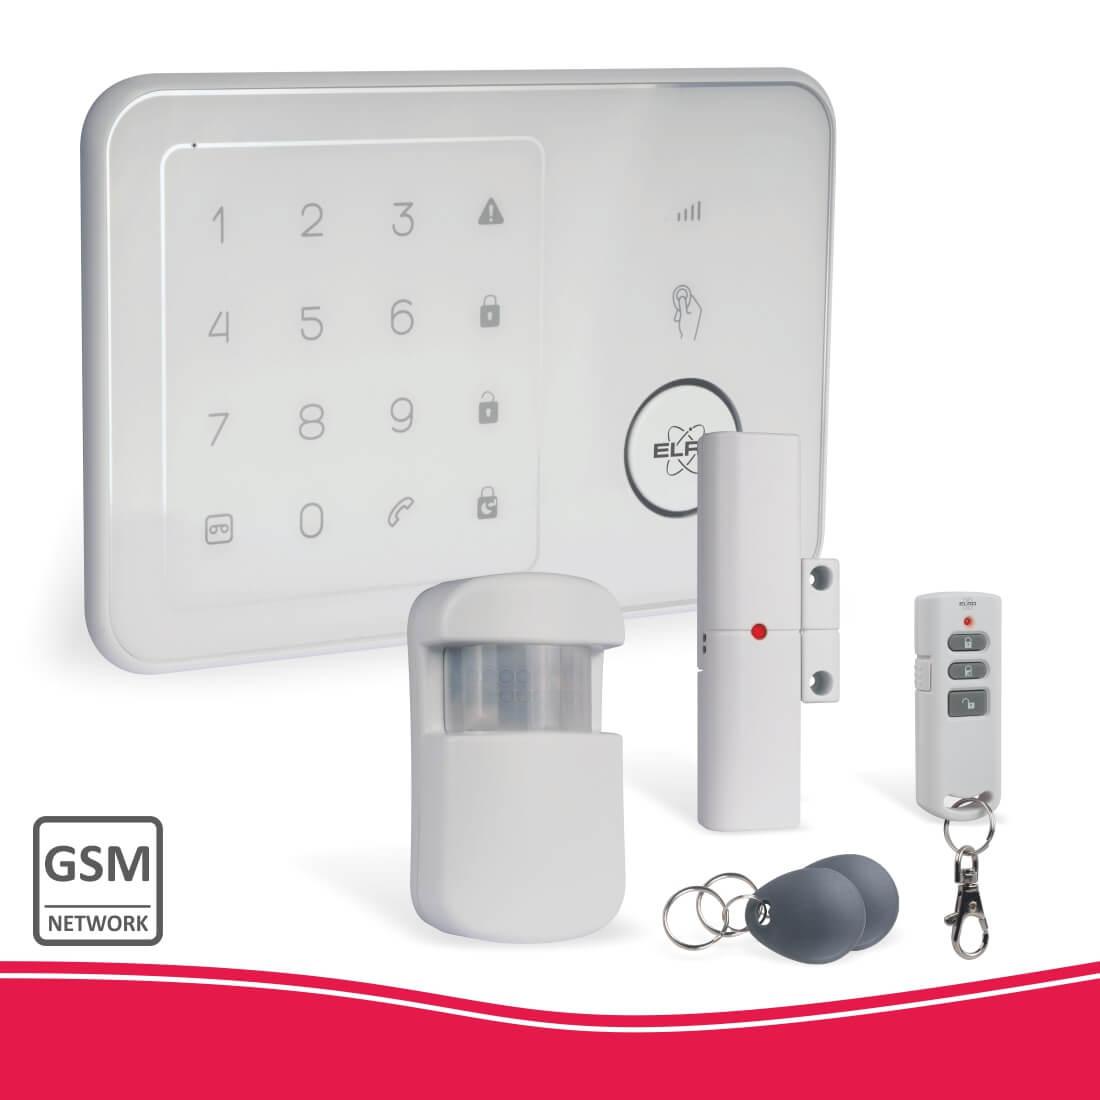 ELRO thuis alarmsysteem